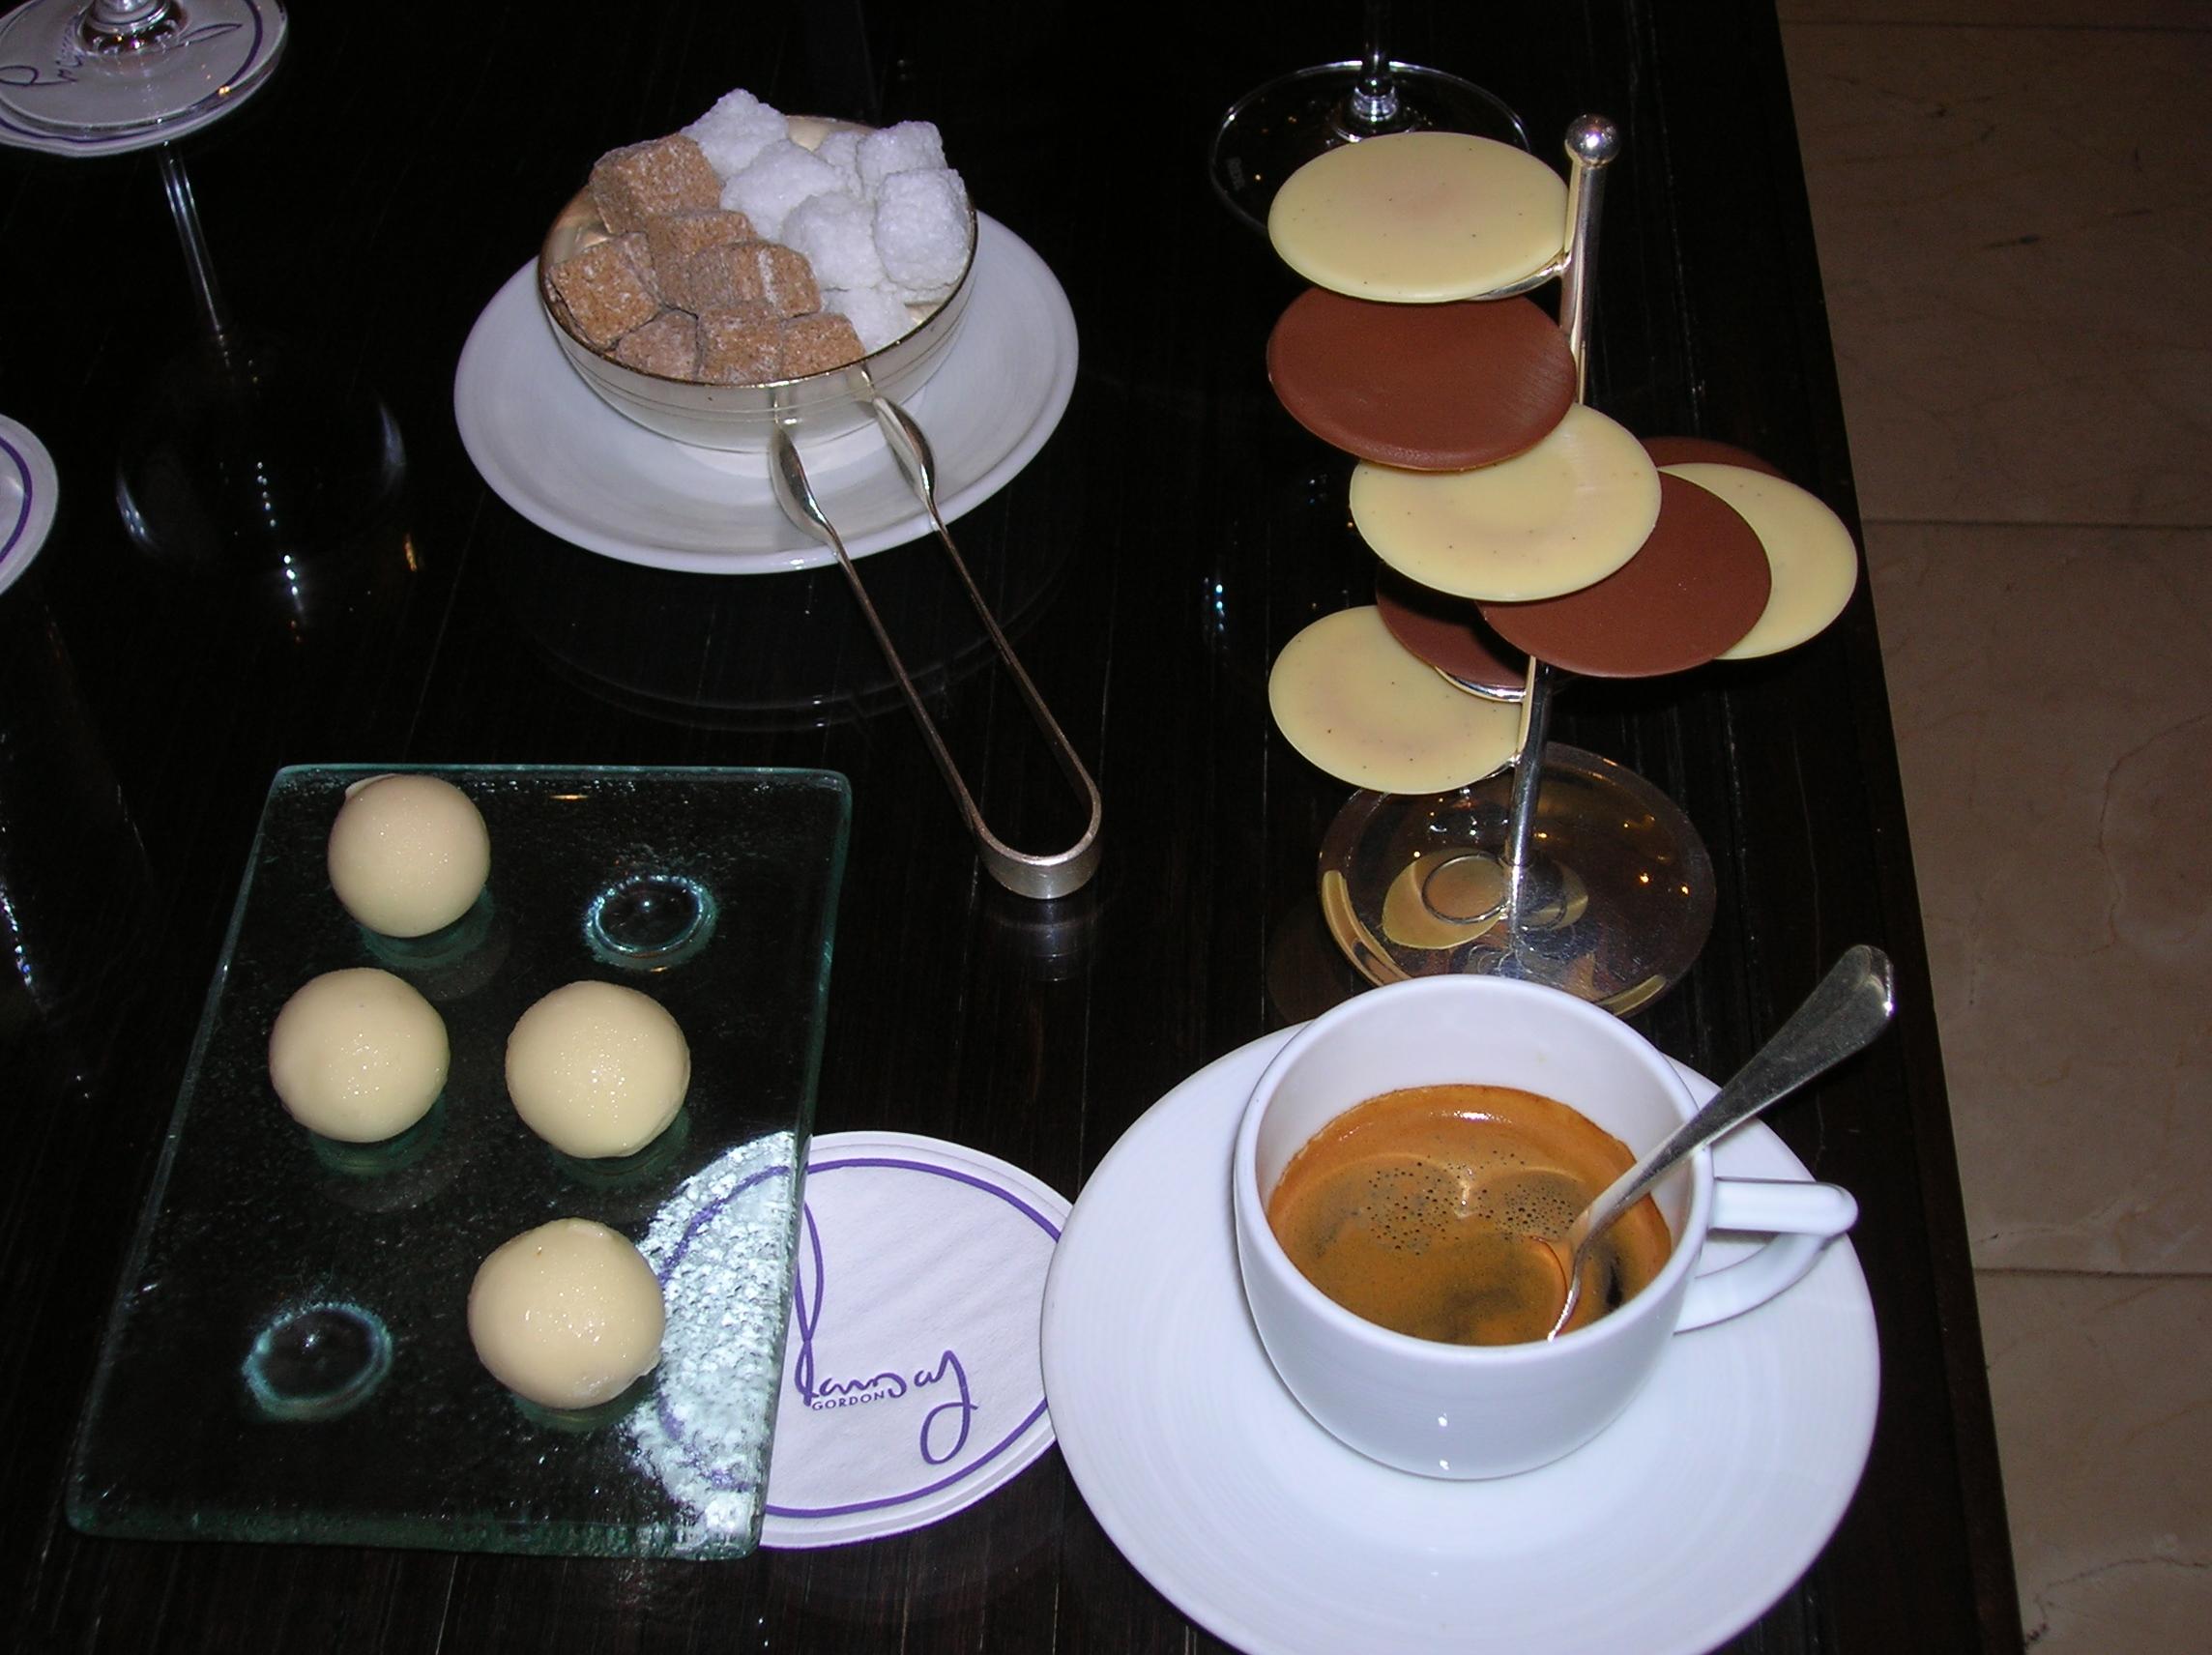 File:Gordon Ramsay Coffee and Desserts.JPG - Wikimedia Commons